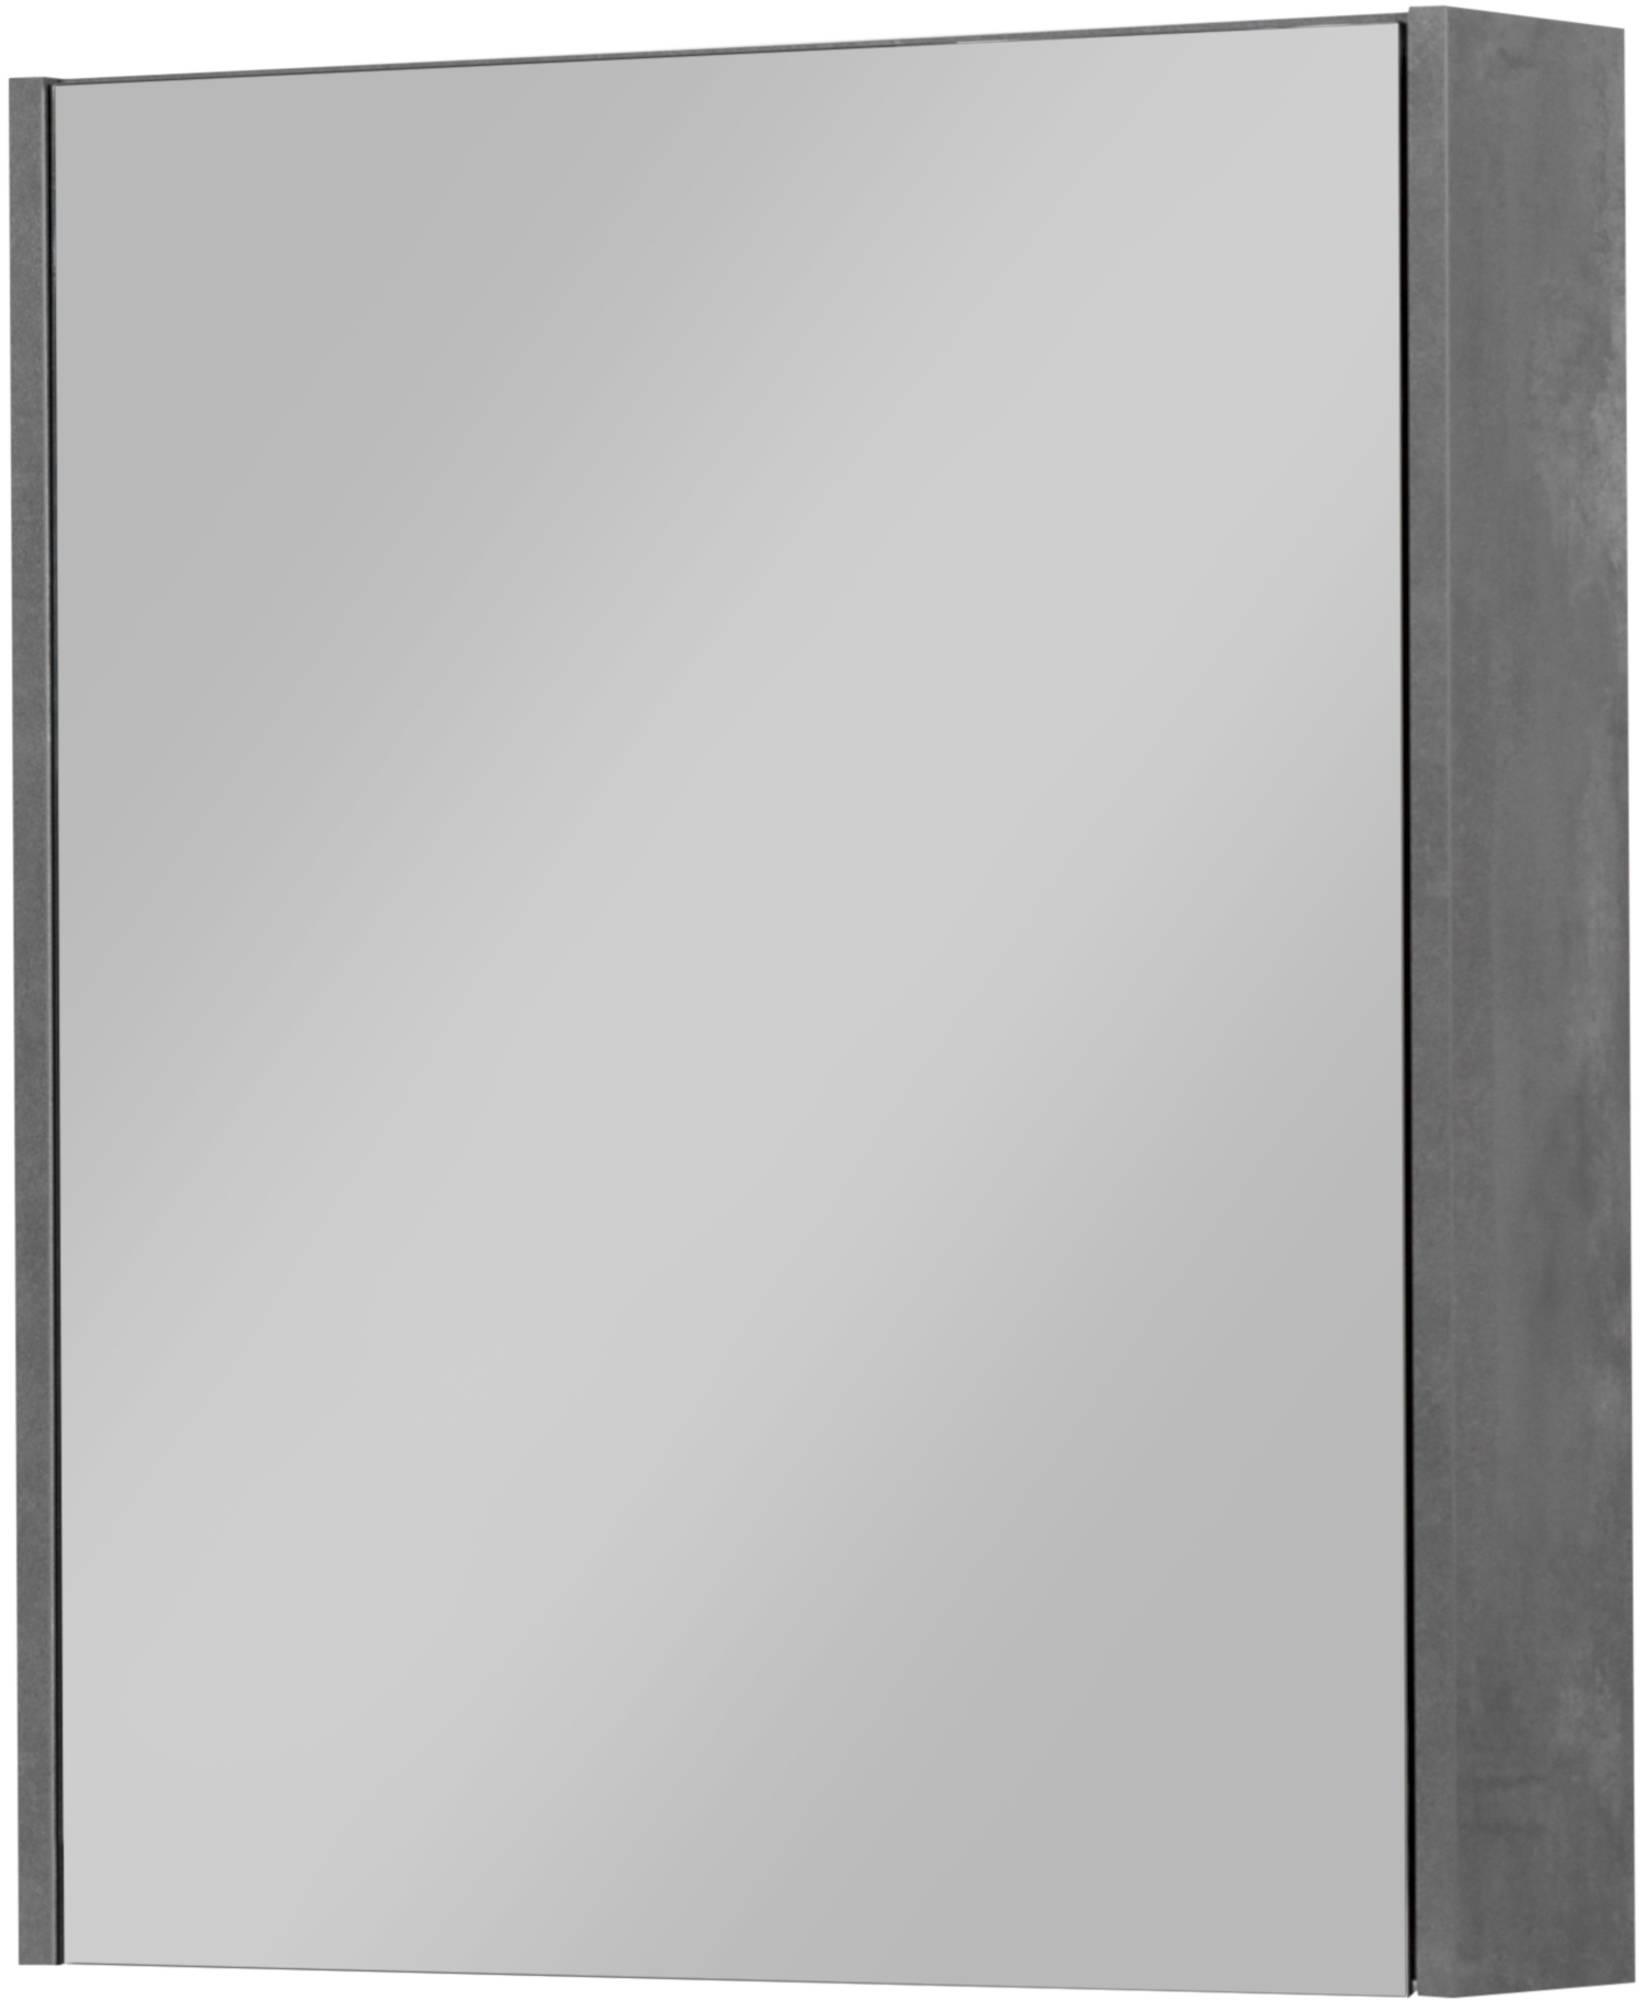 Saniselect Socan Spiegelkast 60x14x70 cm Beton Grijs